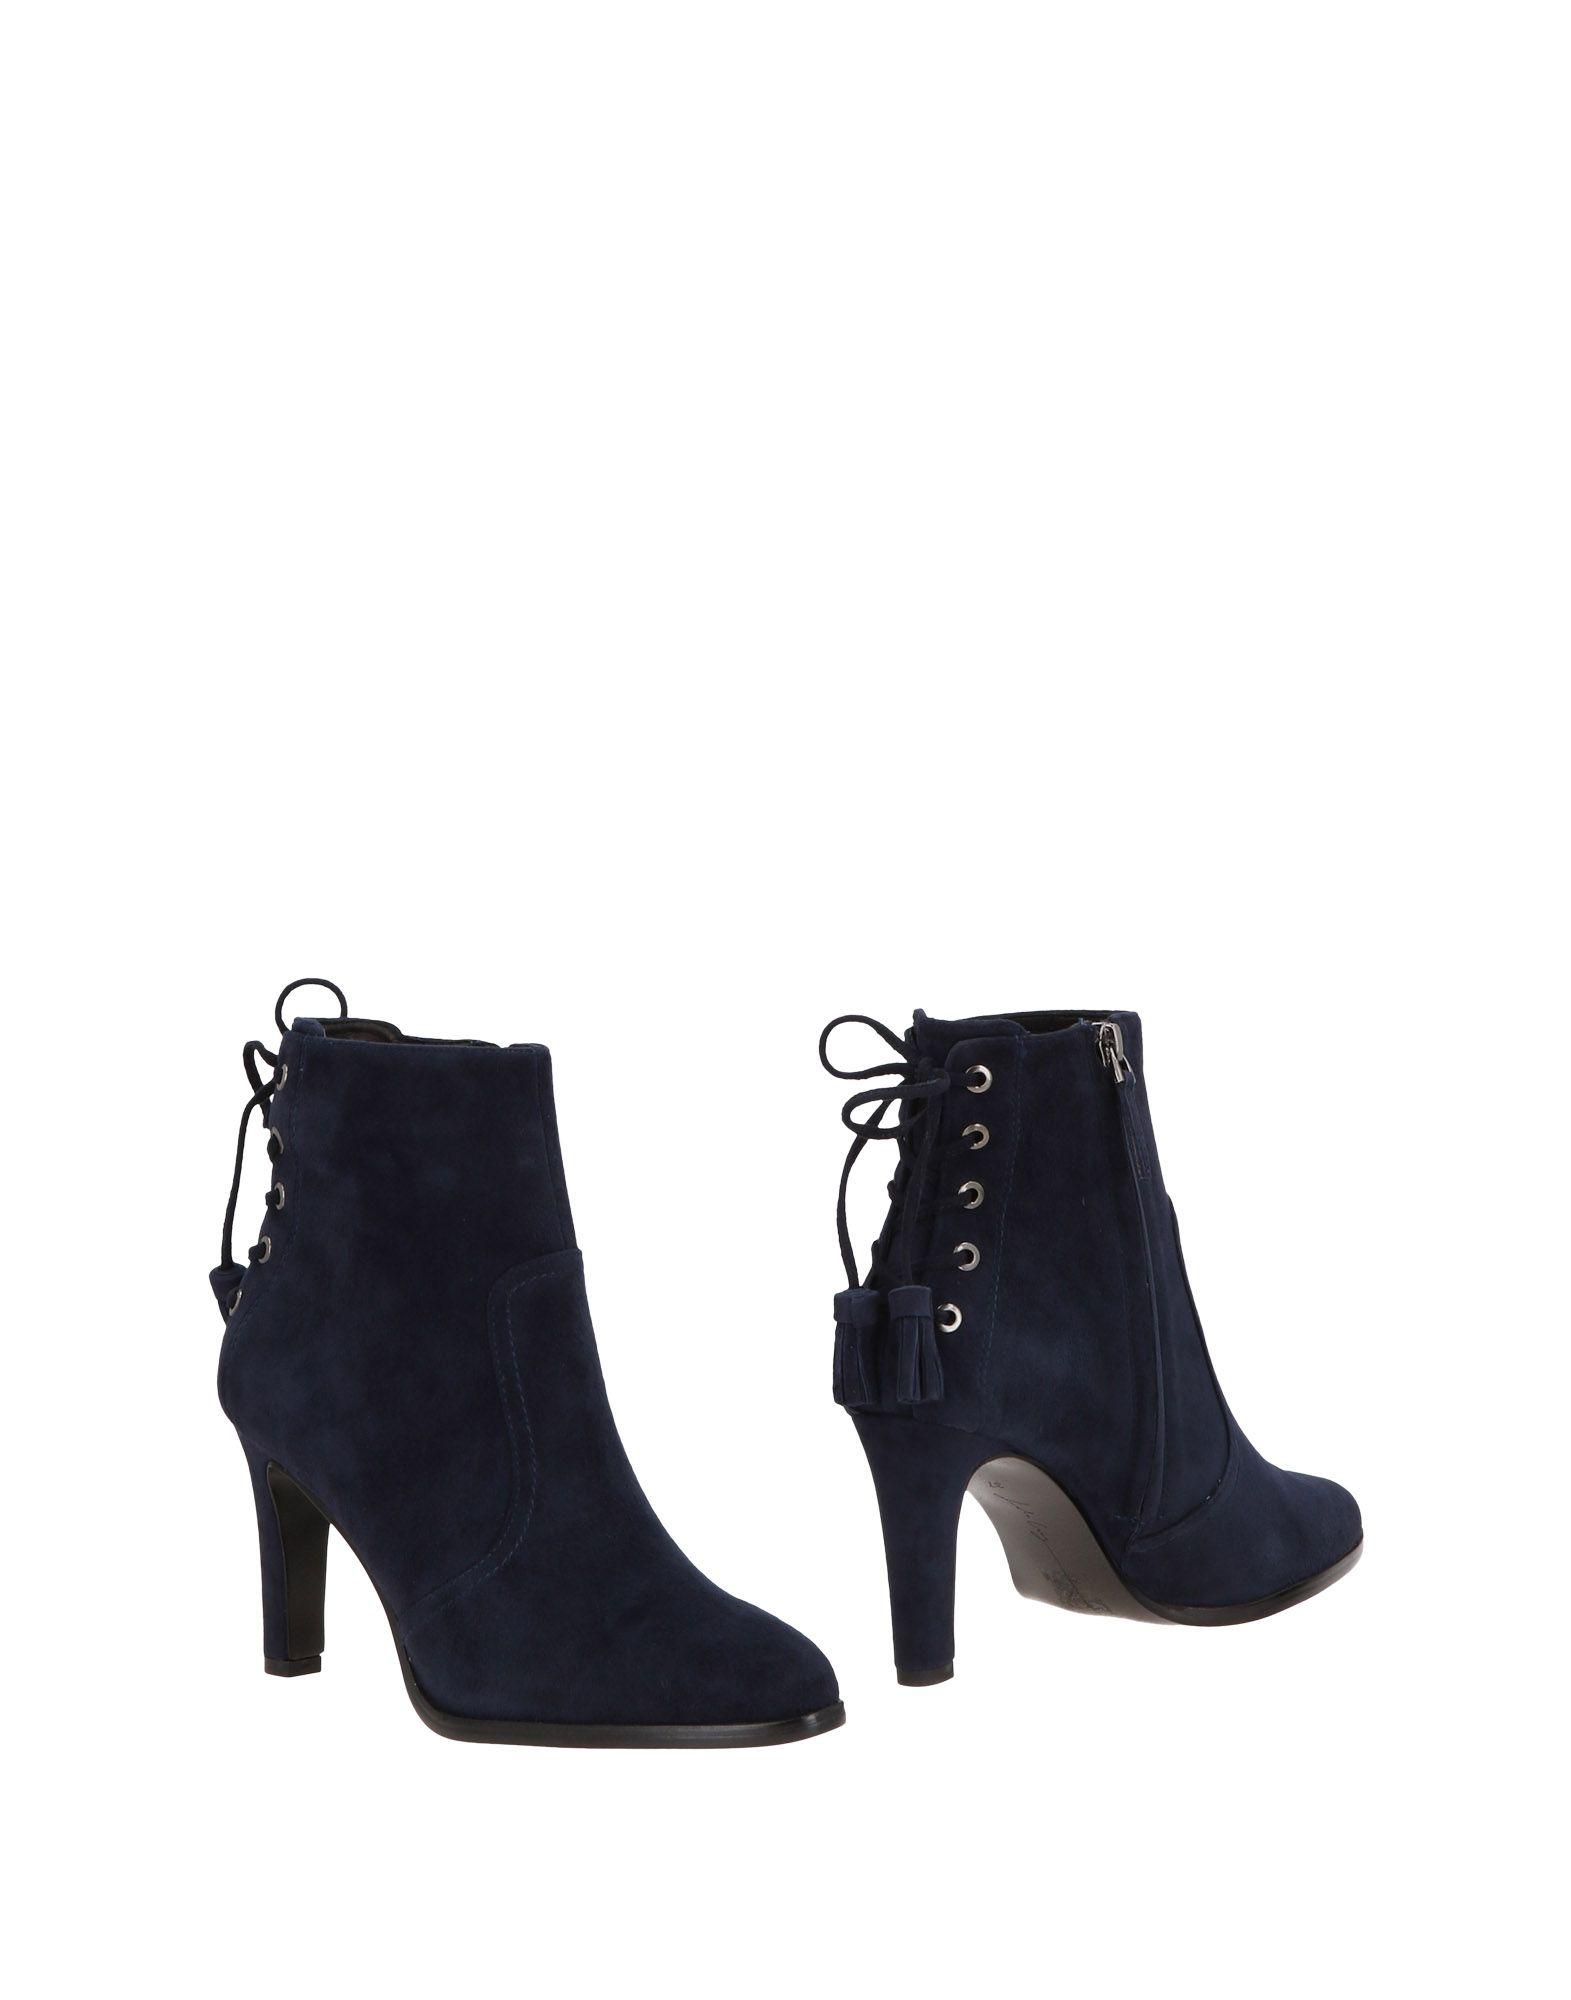 Bottine Lola Cruz Femme - Bottines Lola Cruz Noir Chaussures casual sauvages